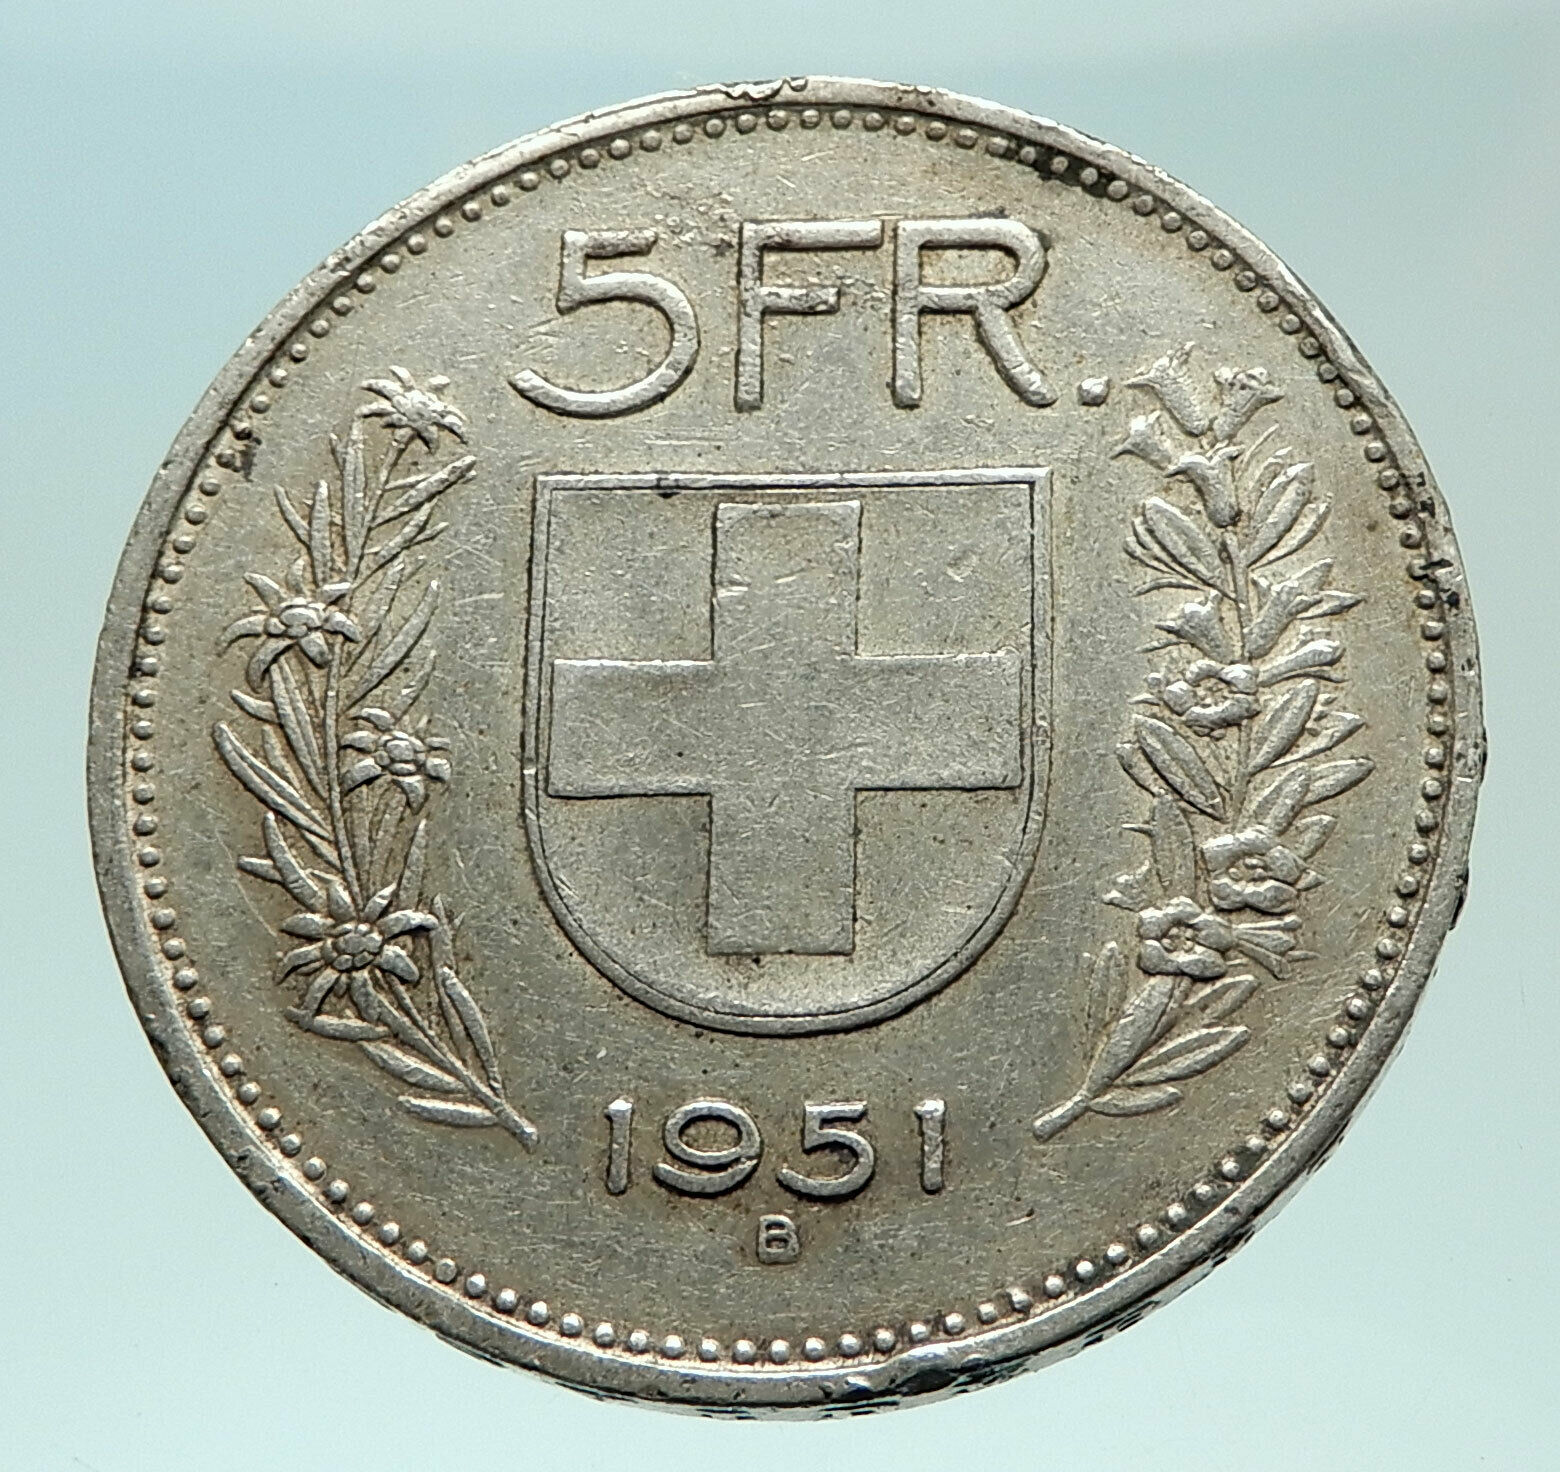 1951 Switzerland Founding HERO WILLIAM TELL 5 Francs Silver Swiss Coin i75957 2